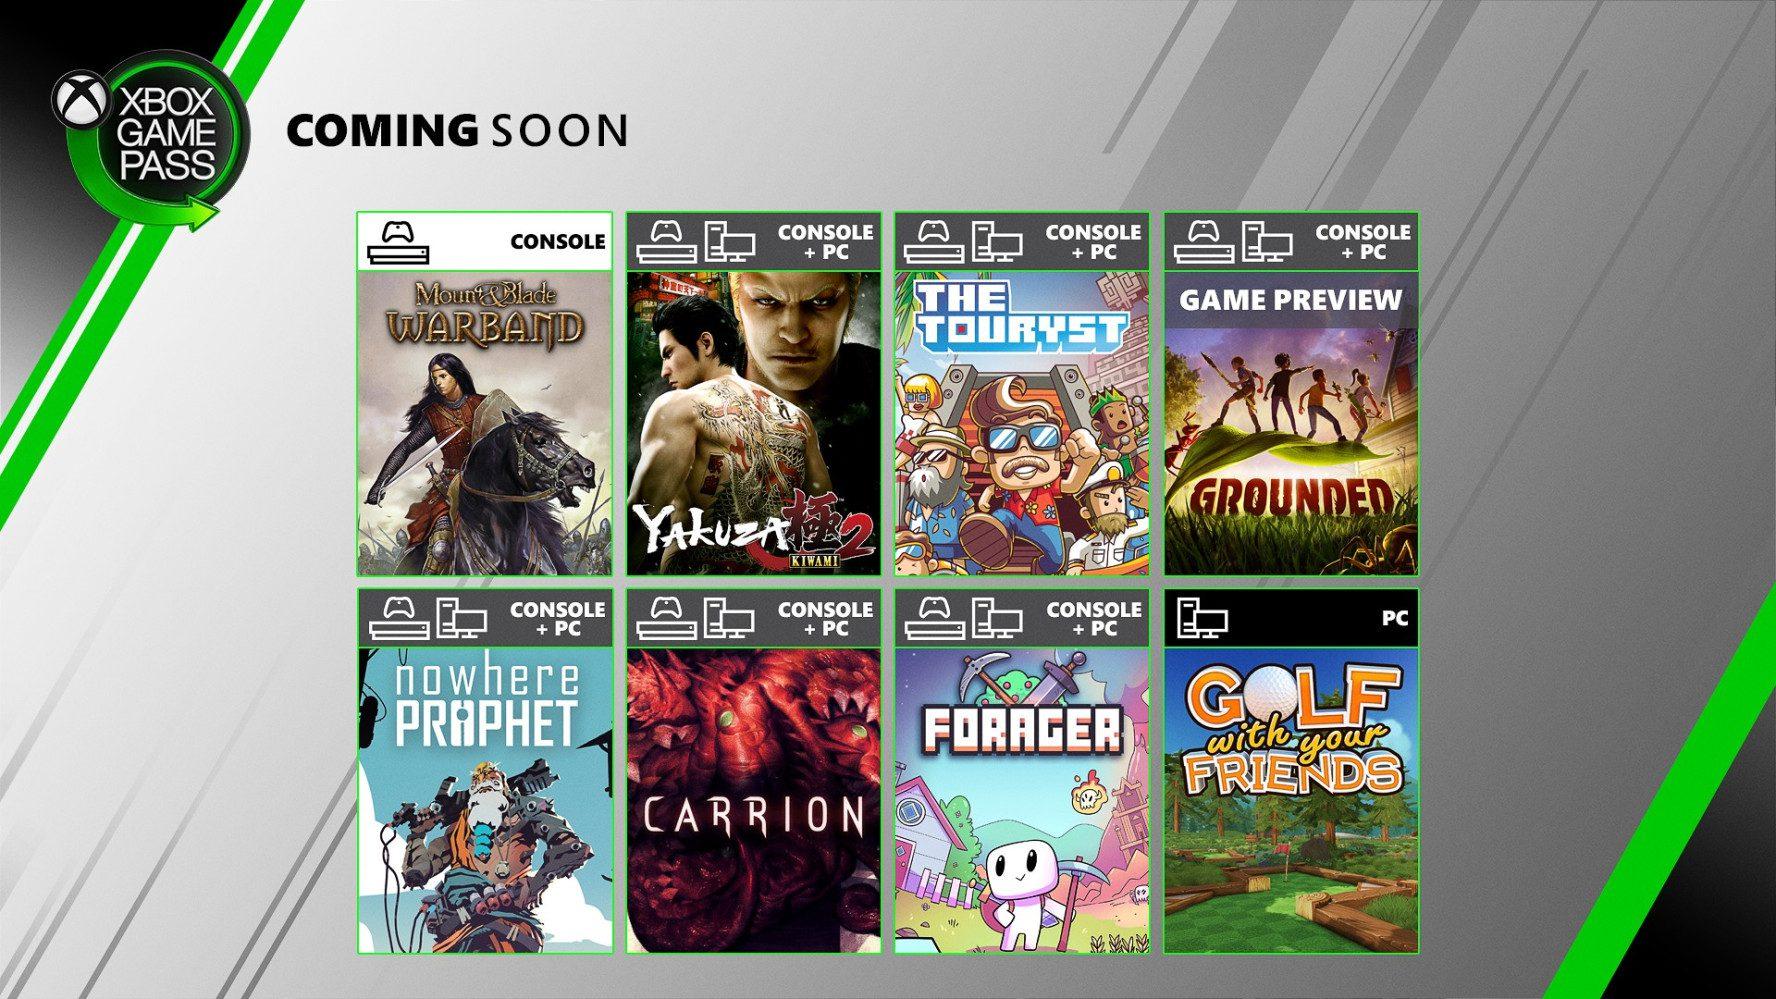 Desvelada la segunda tanda de juegos de julio para Xbox Game Pass